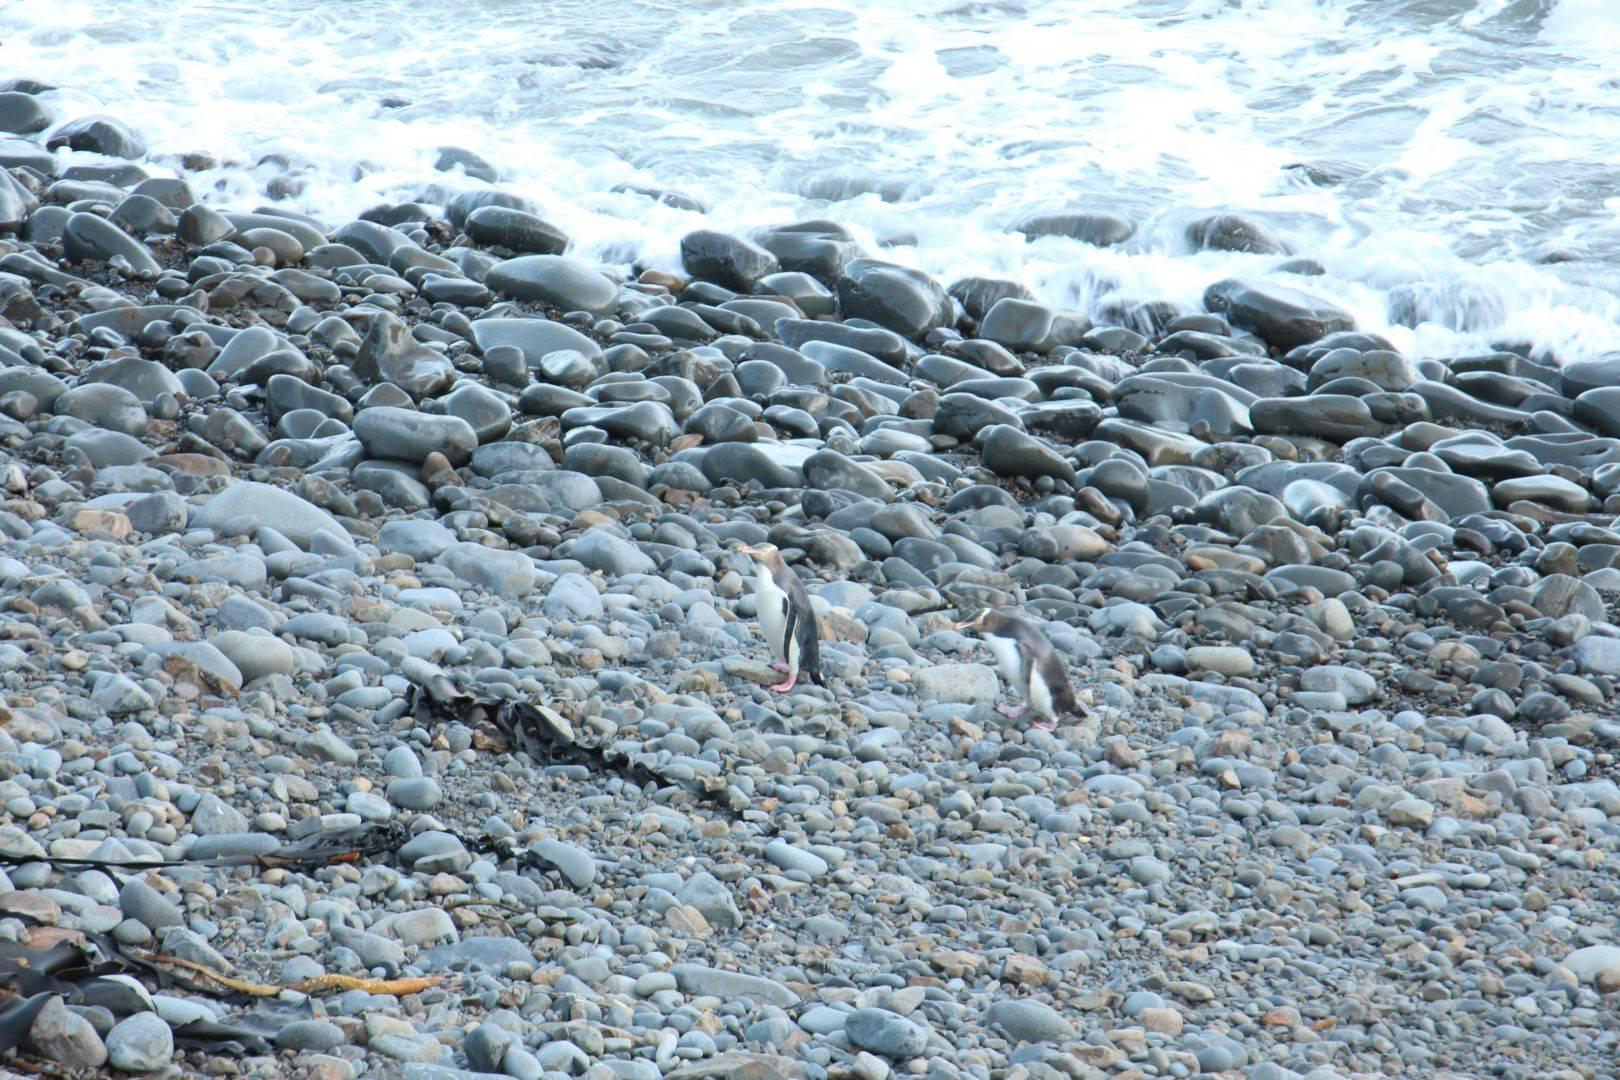 Penguins in beach